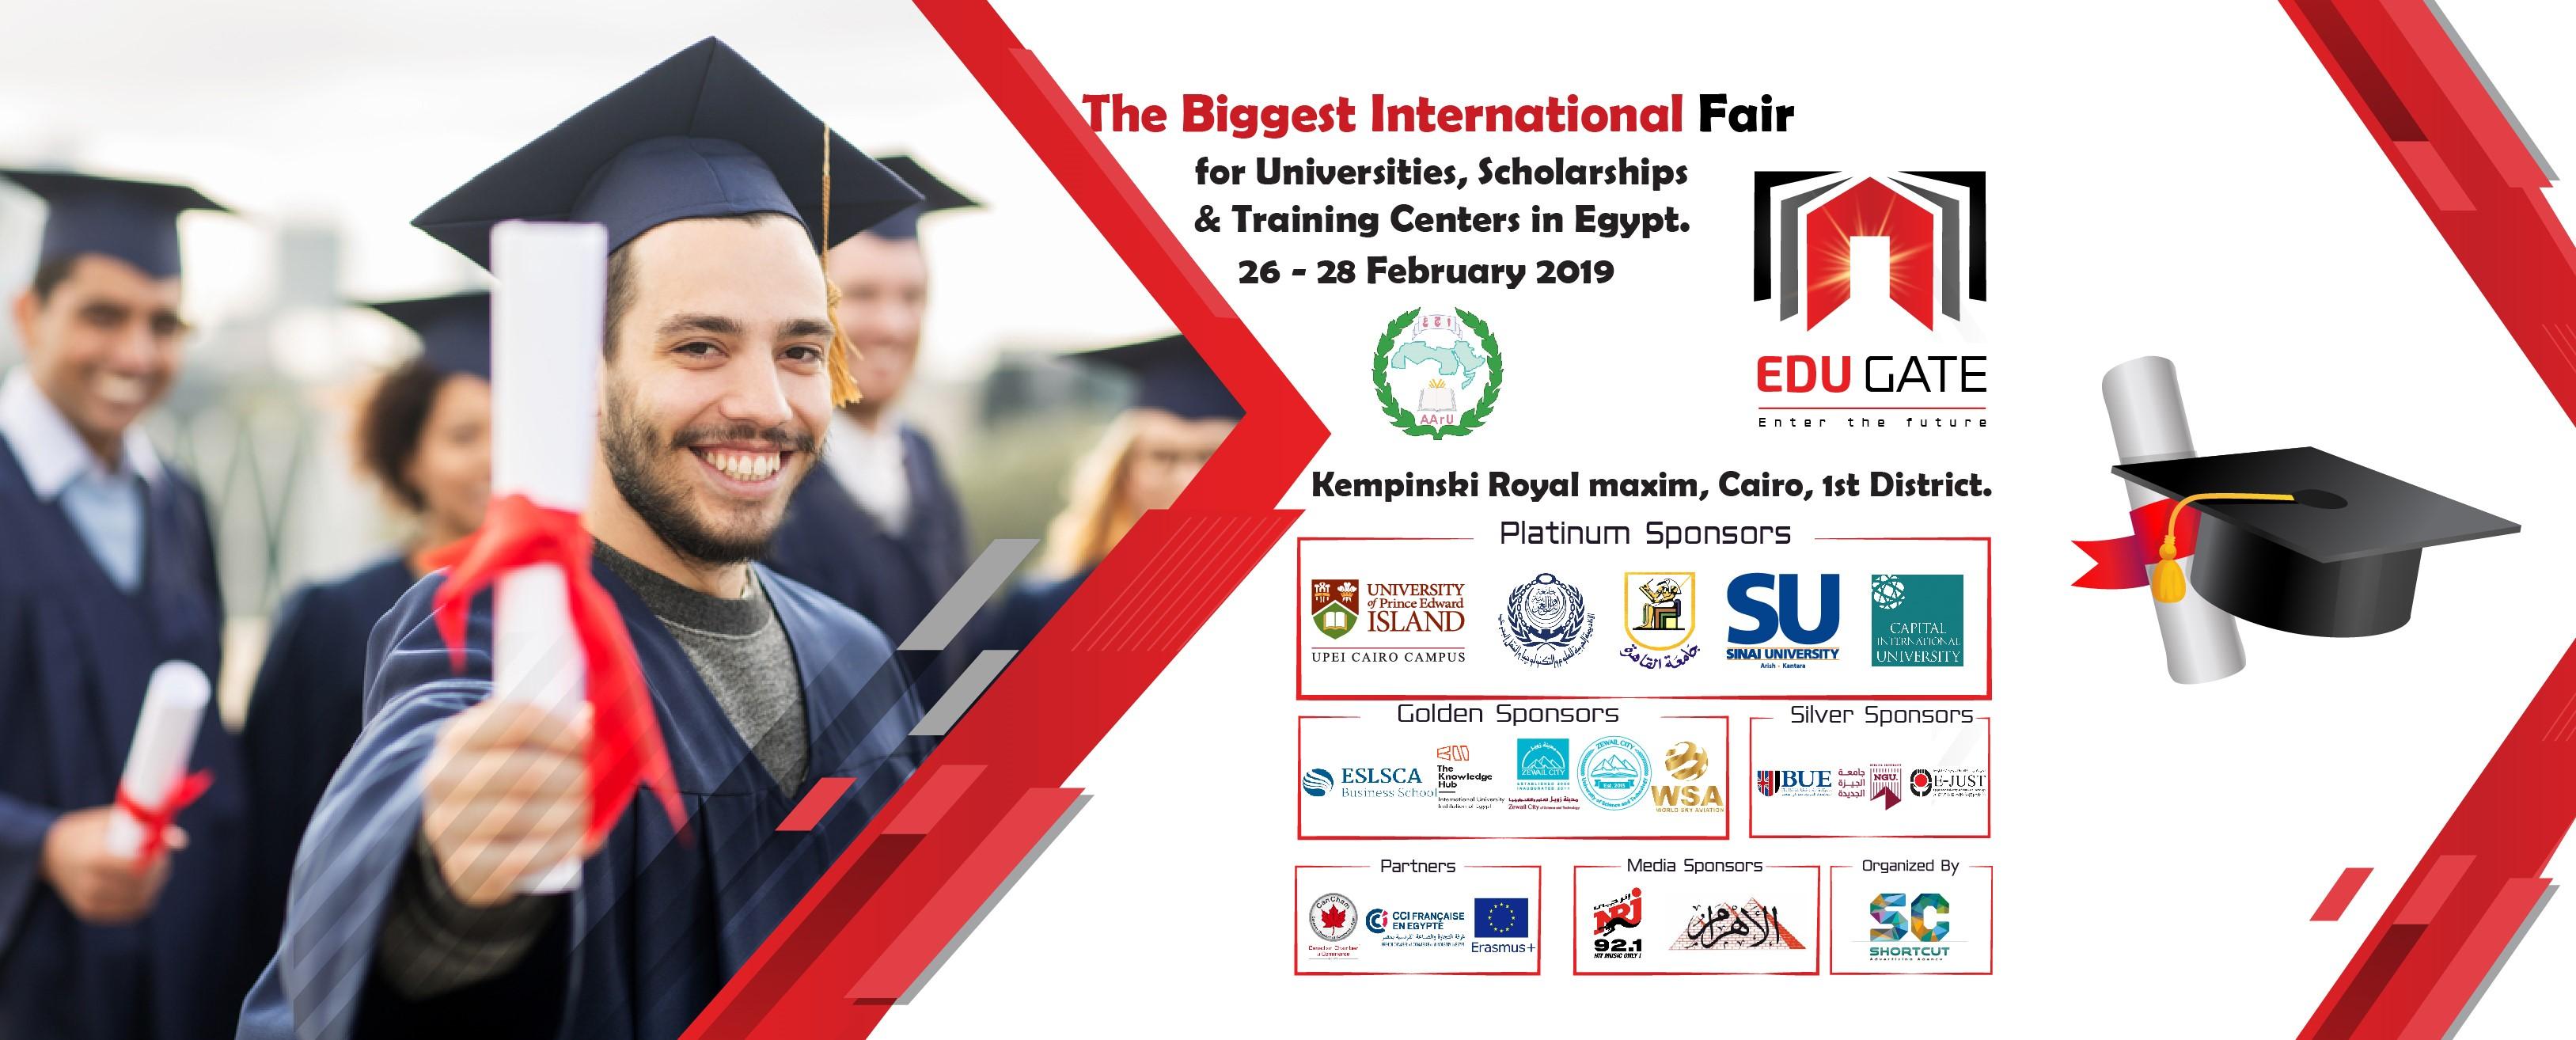 The Fourth International Educational Fair EDU GATE 2019